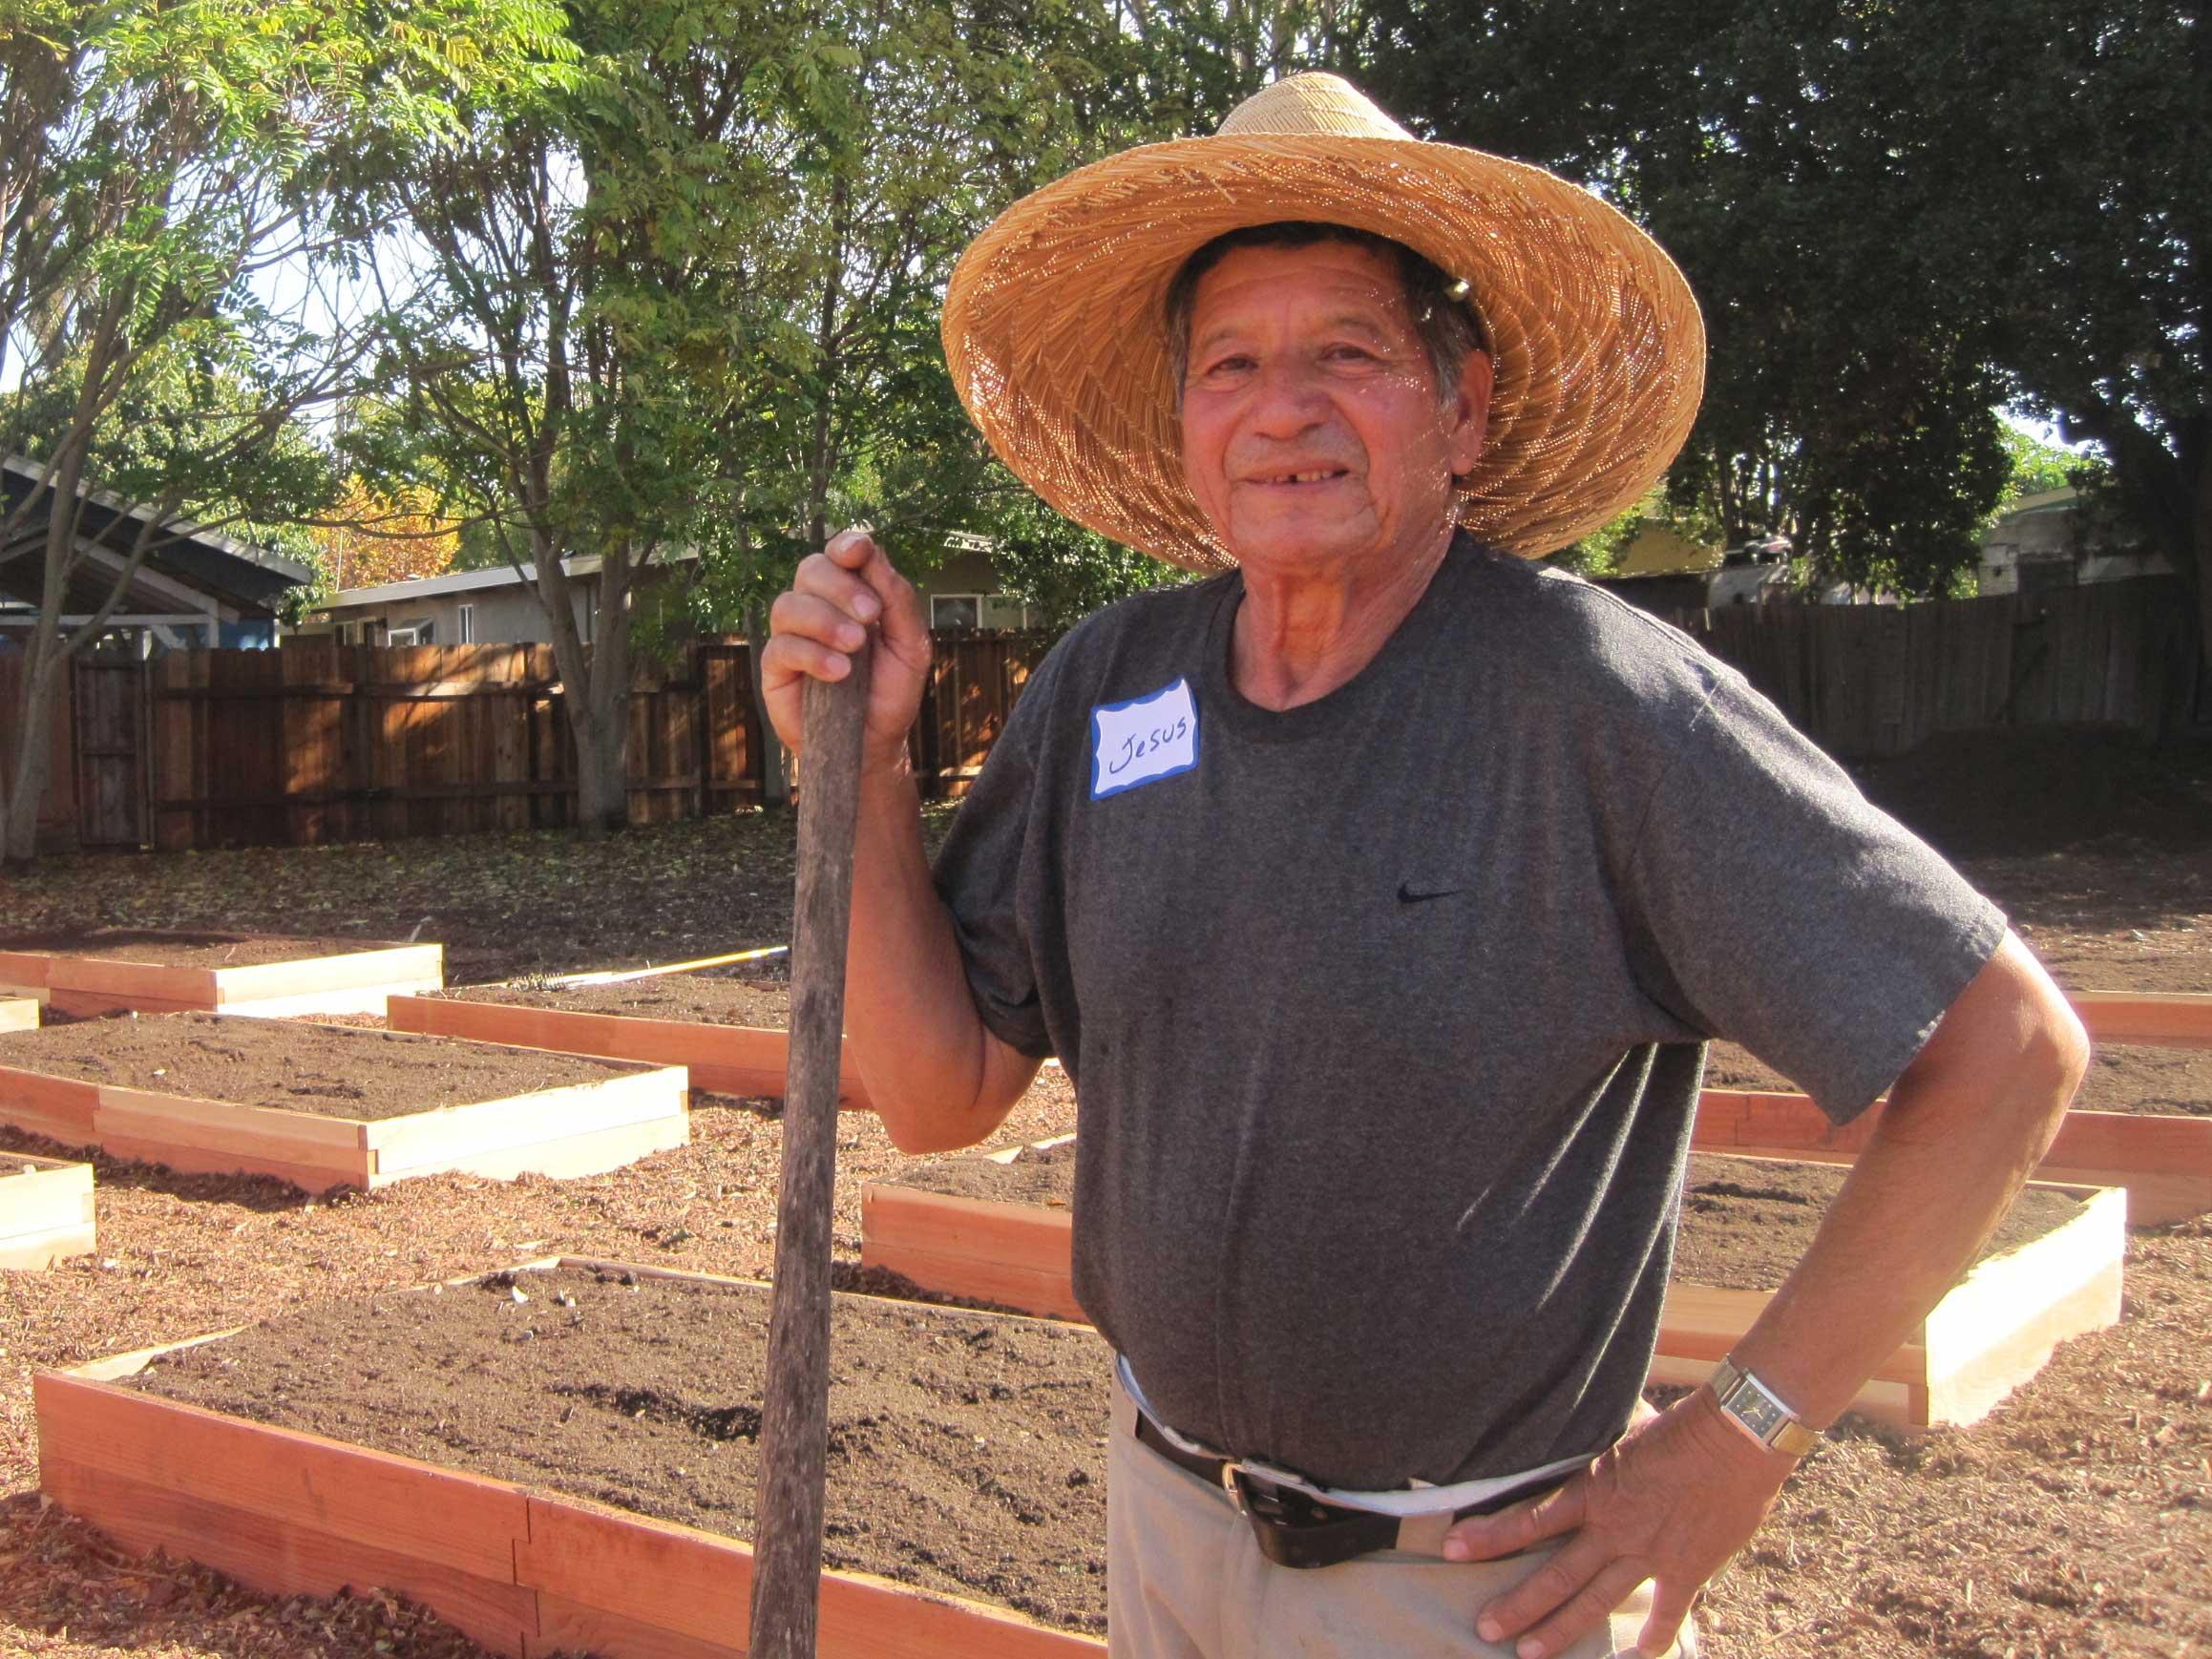 jesus becerra helps build belle havens first community garden on nov 8 2014